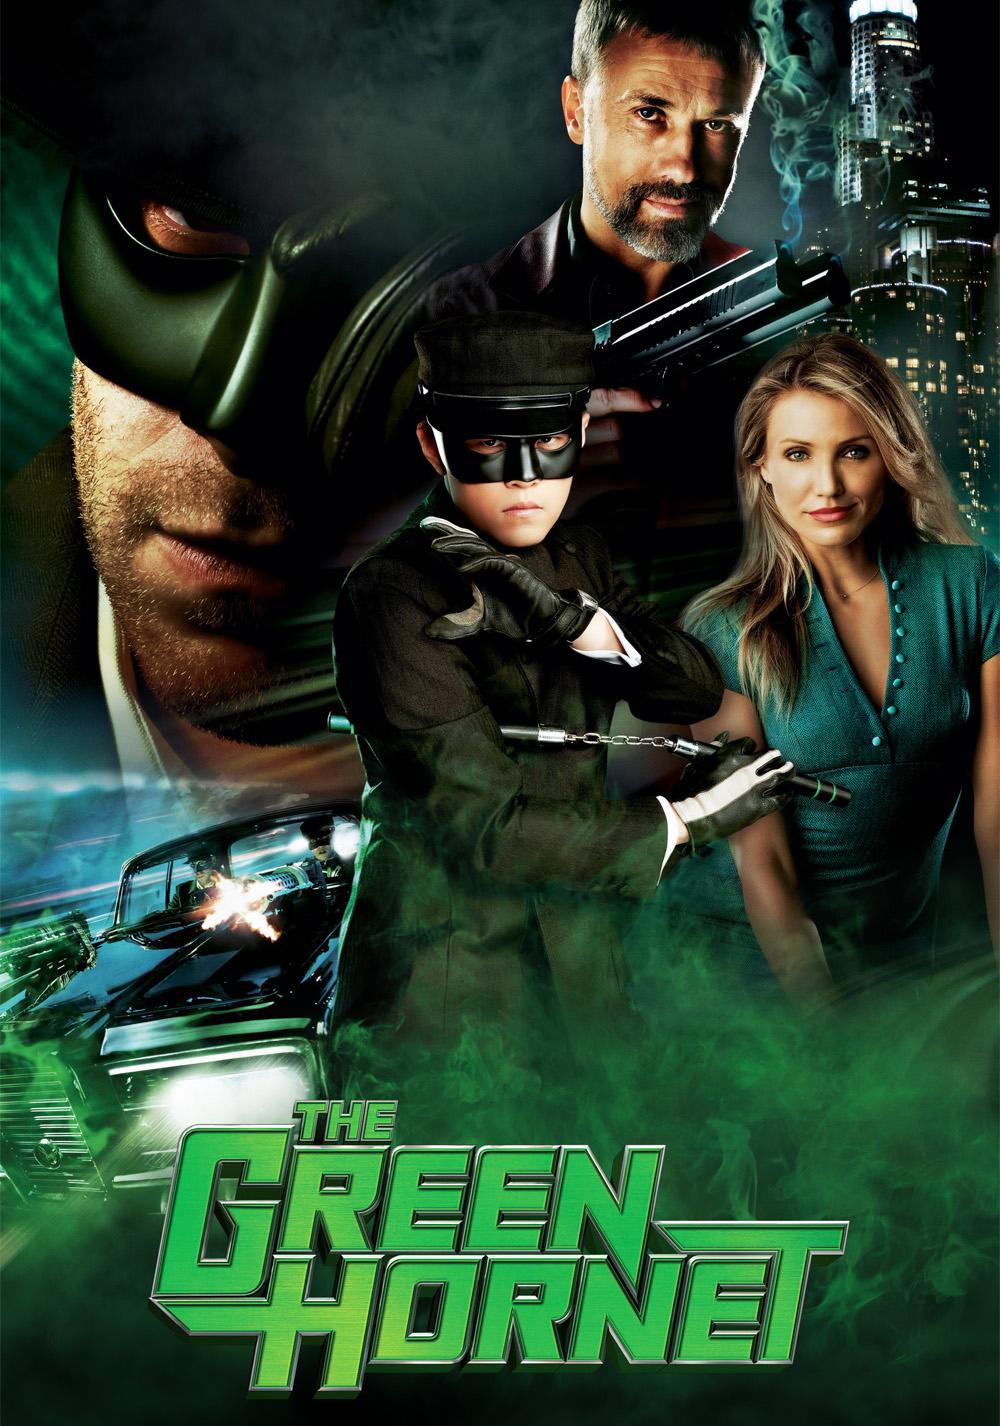 The Green Hornet | Movie fanart | fanart.tv